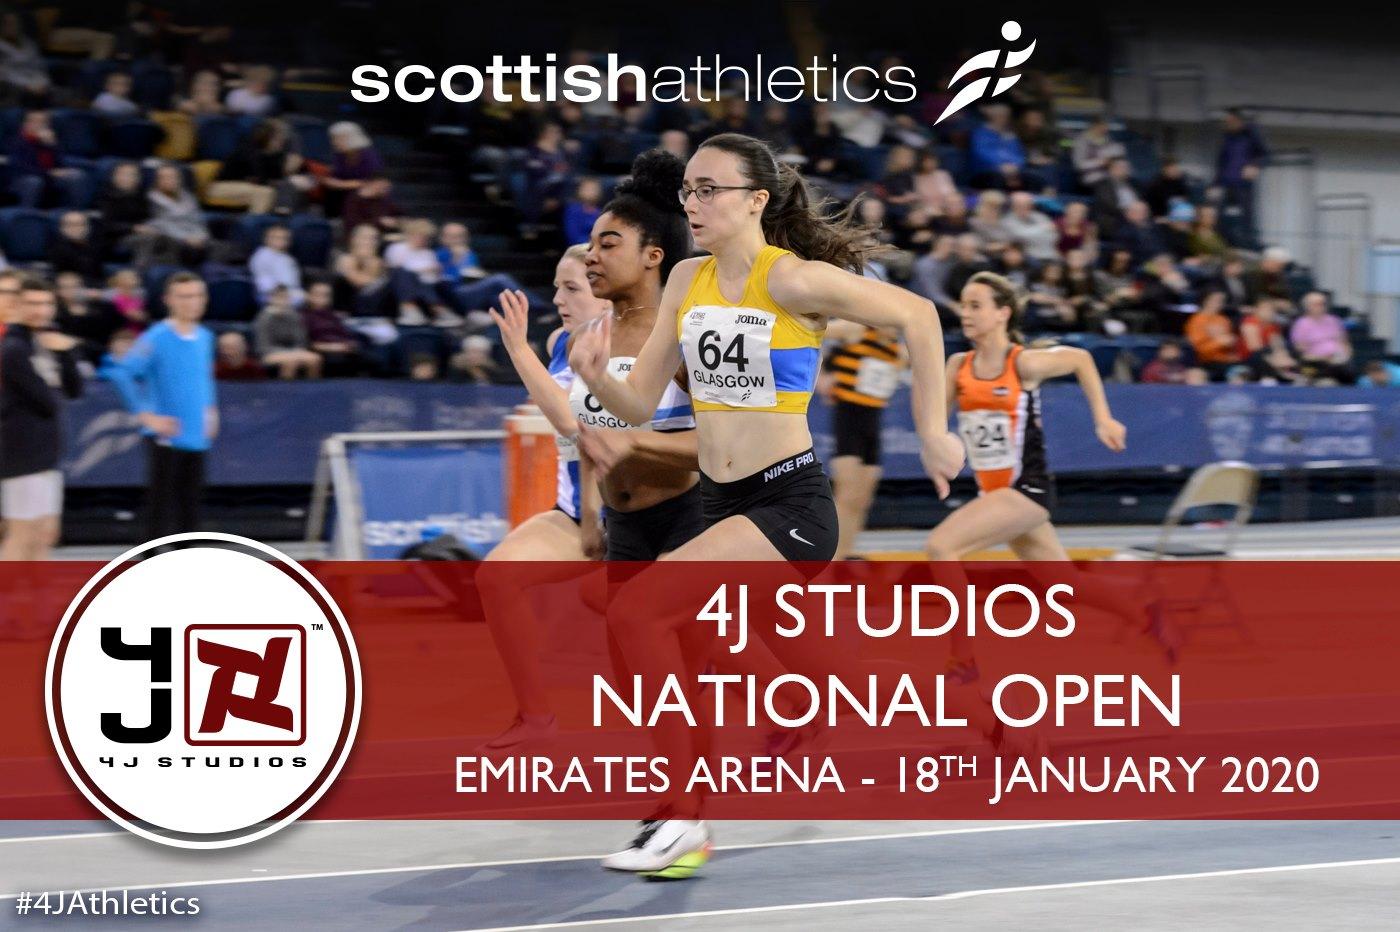 Hundreds ready for 4J Studios National Open - Scottish Athletics